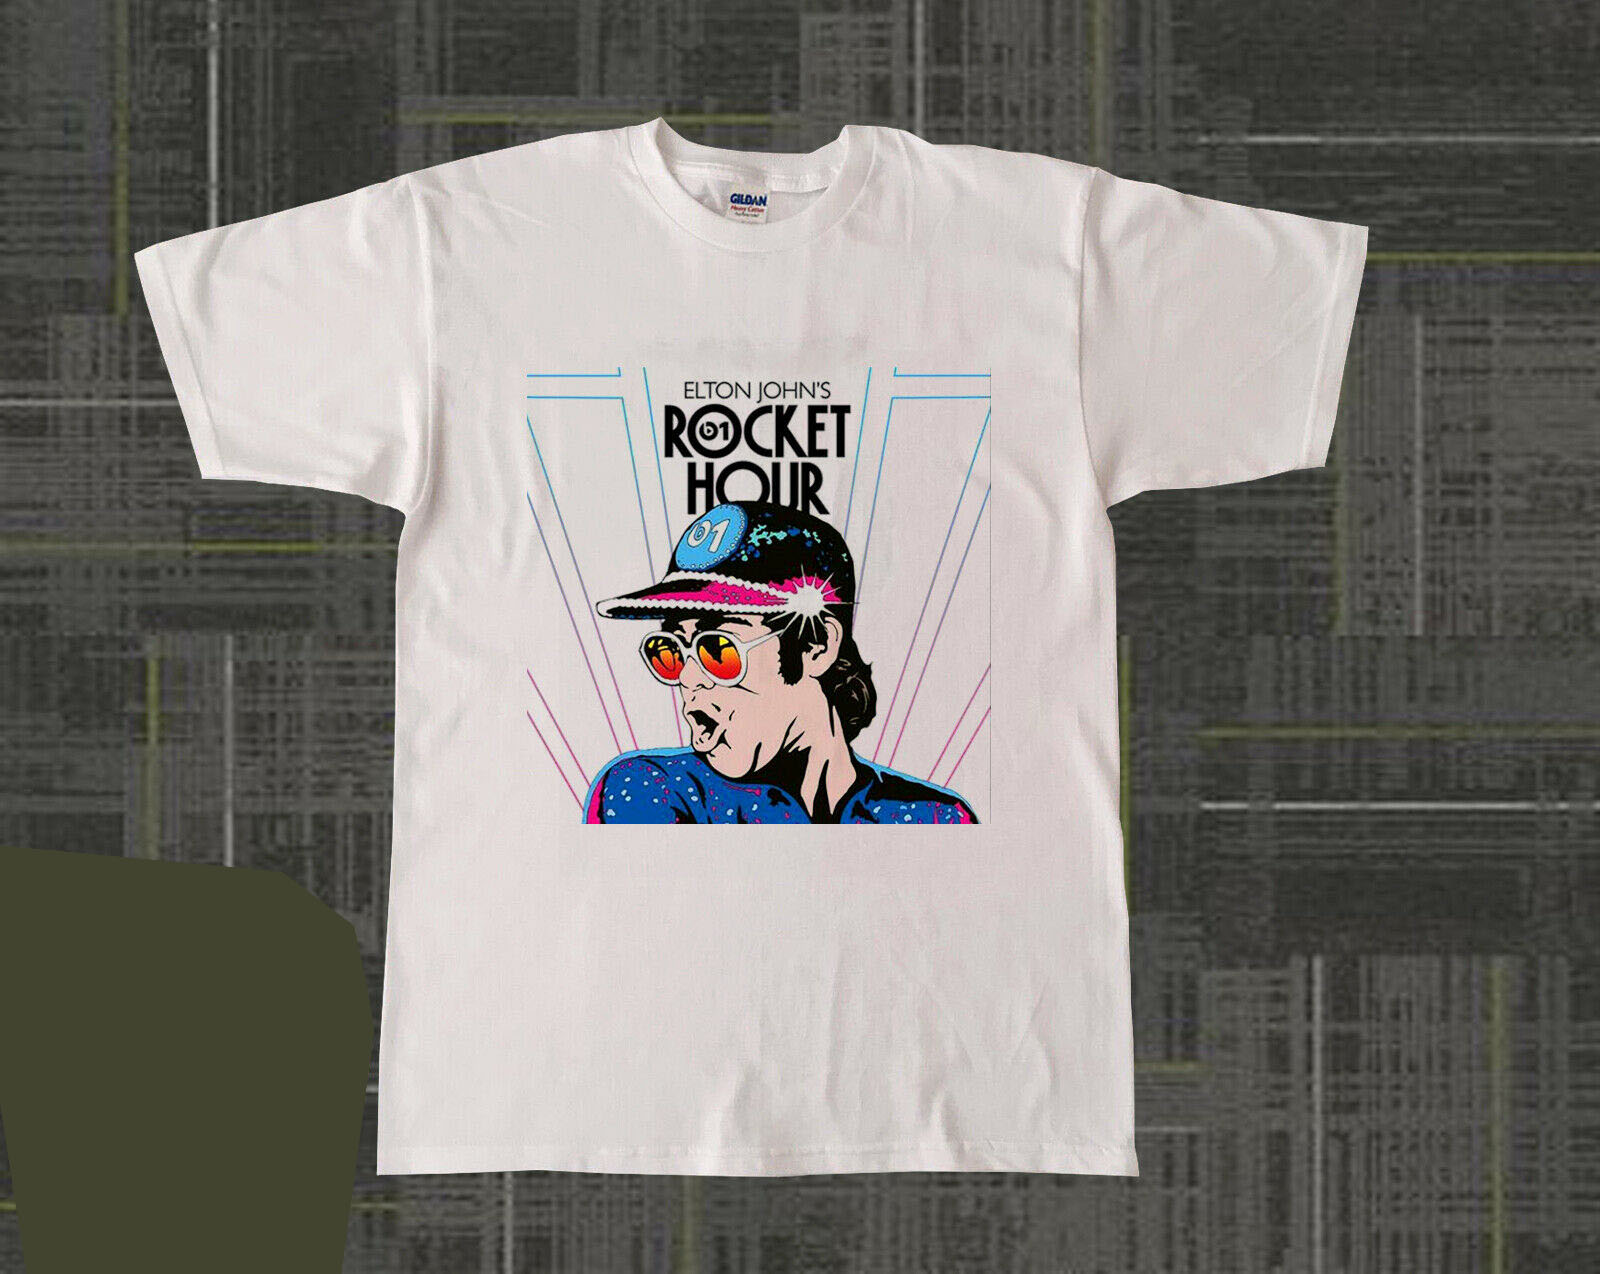 c50269c0 FREDDY KRUEGER T Shirt Nightmare on Elm Street Halloween Friday13 ...